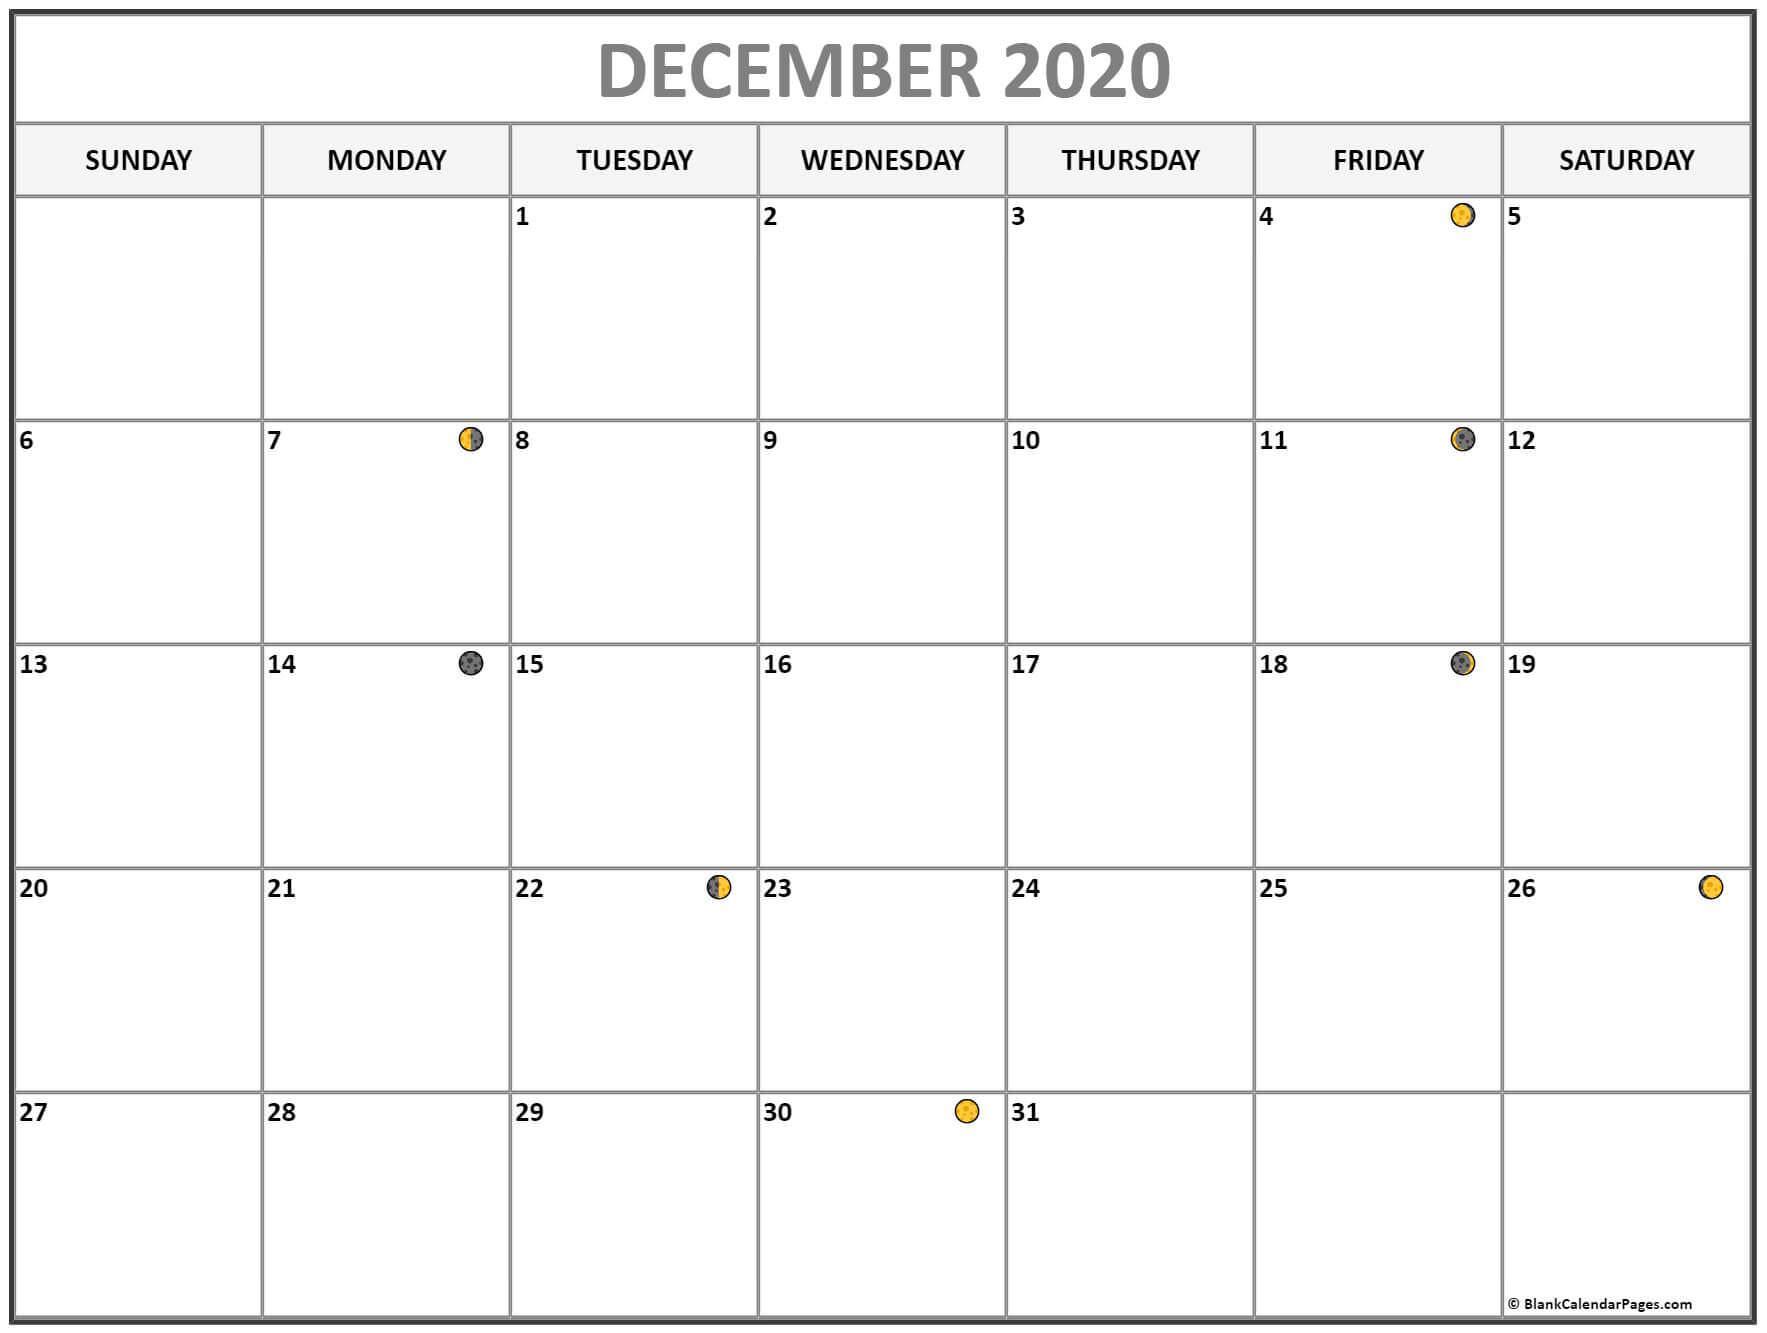 December 2020 Lunar Calendar